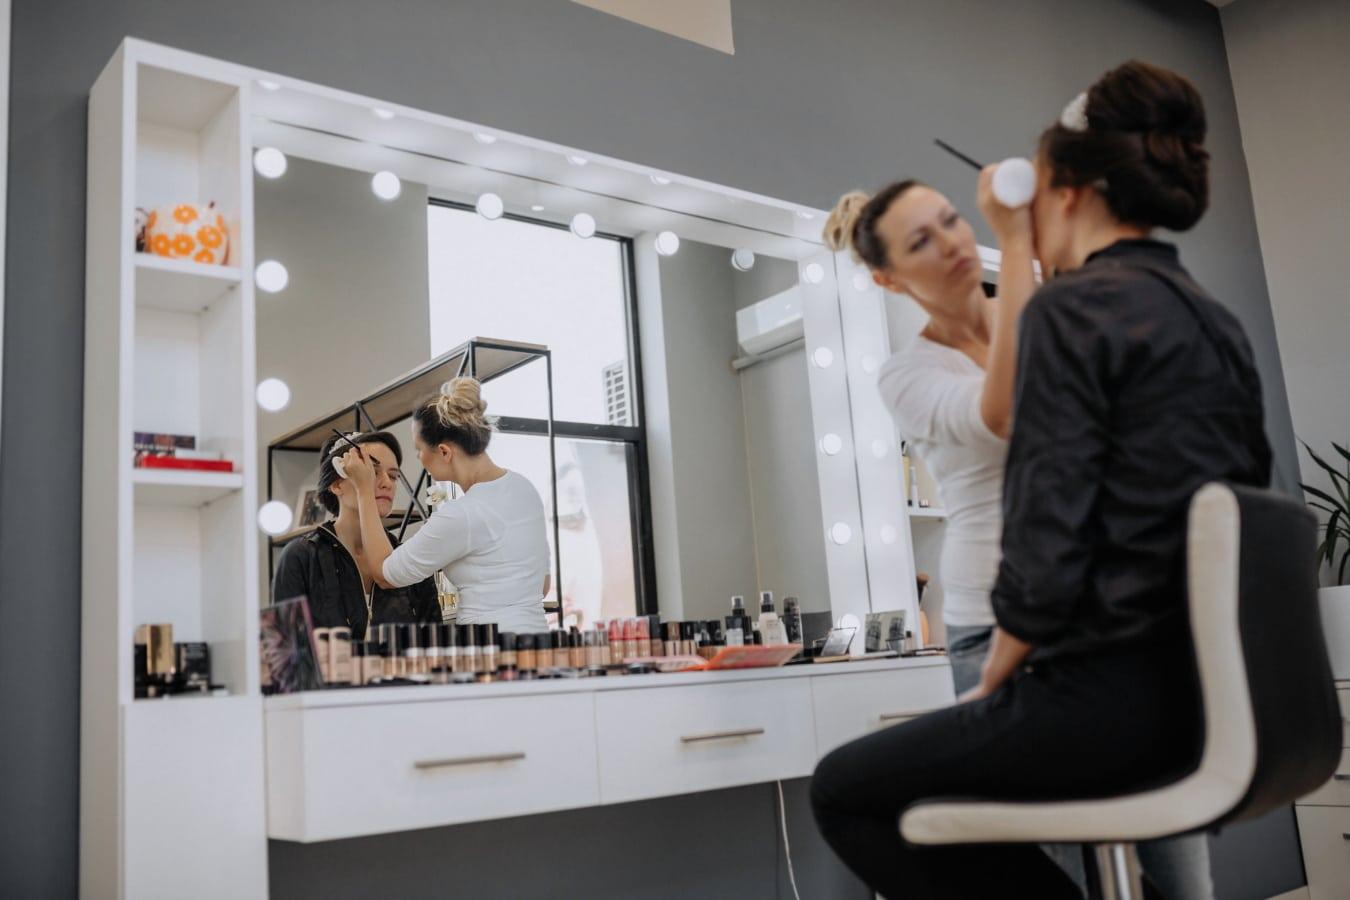 salon, customer, shop, cosmetics, shopkeeper, businesswoman, indoors, mirror, hairdresser, woman